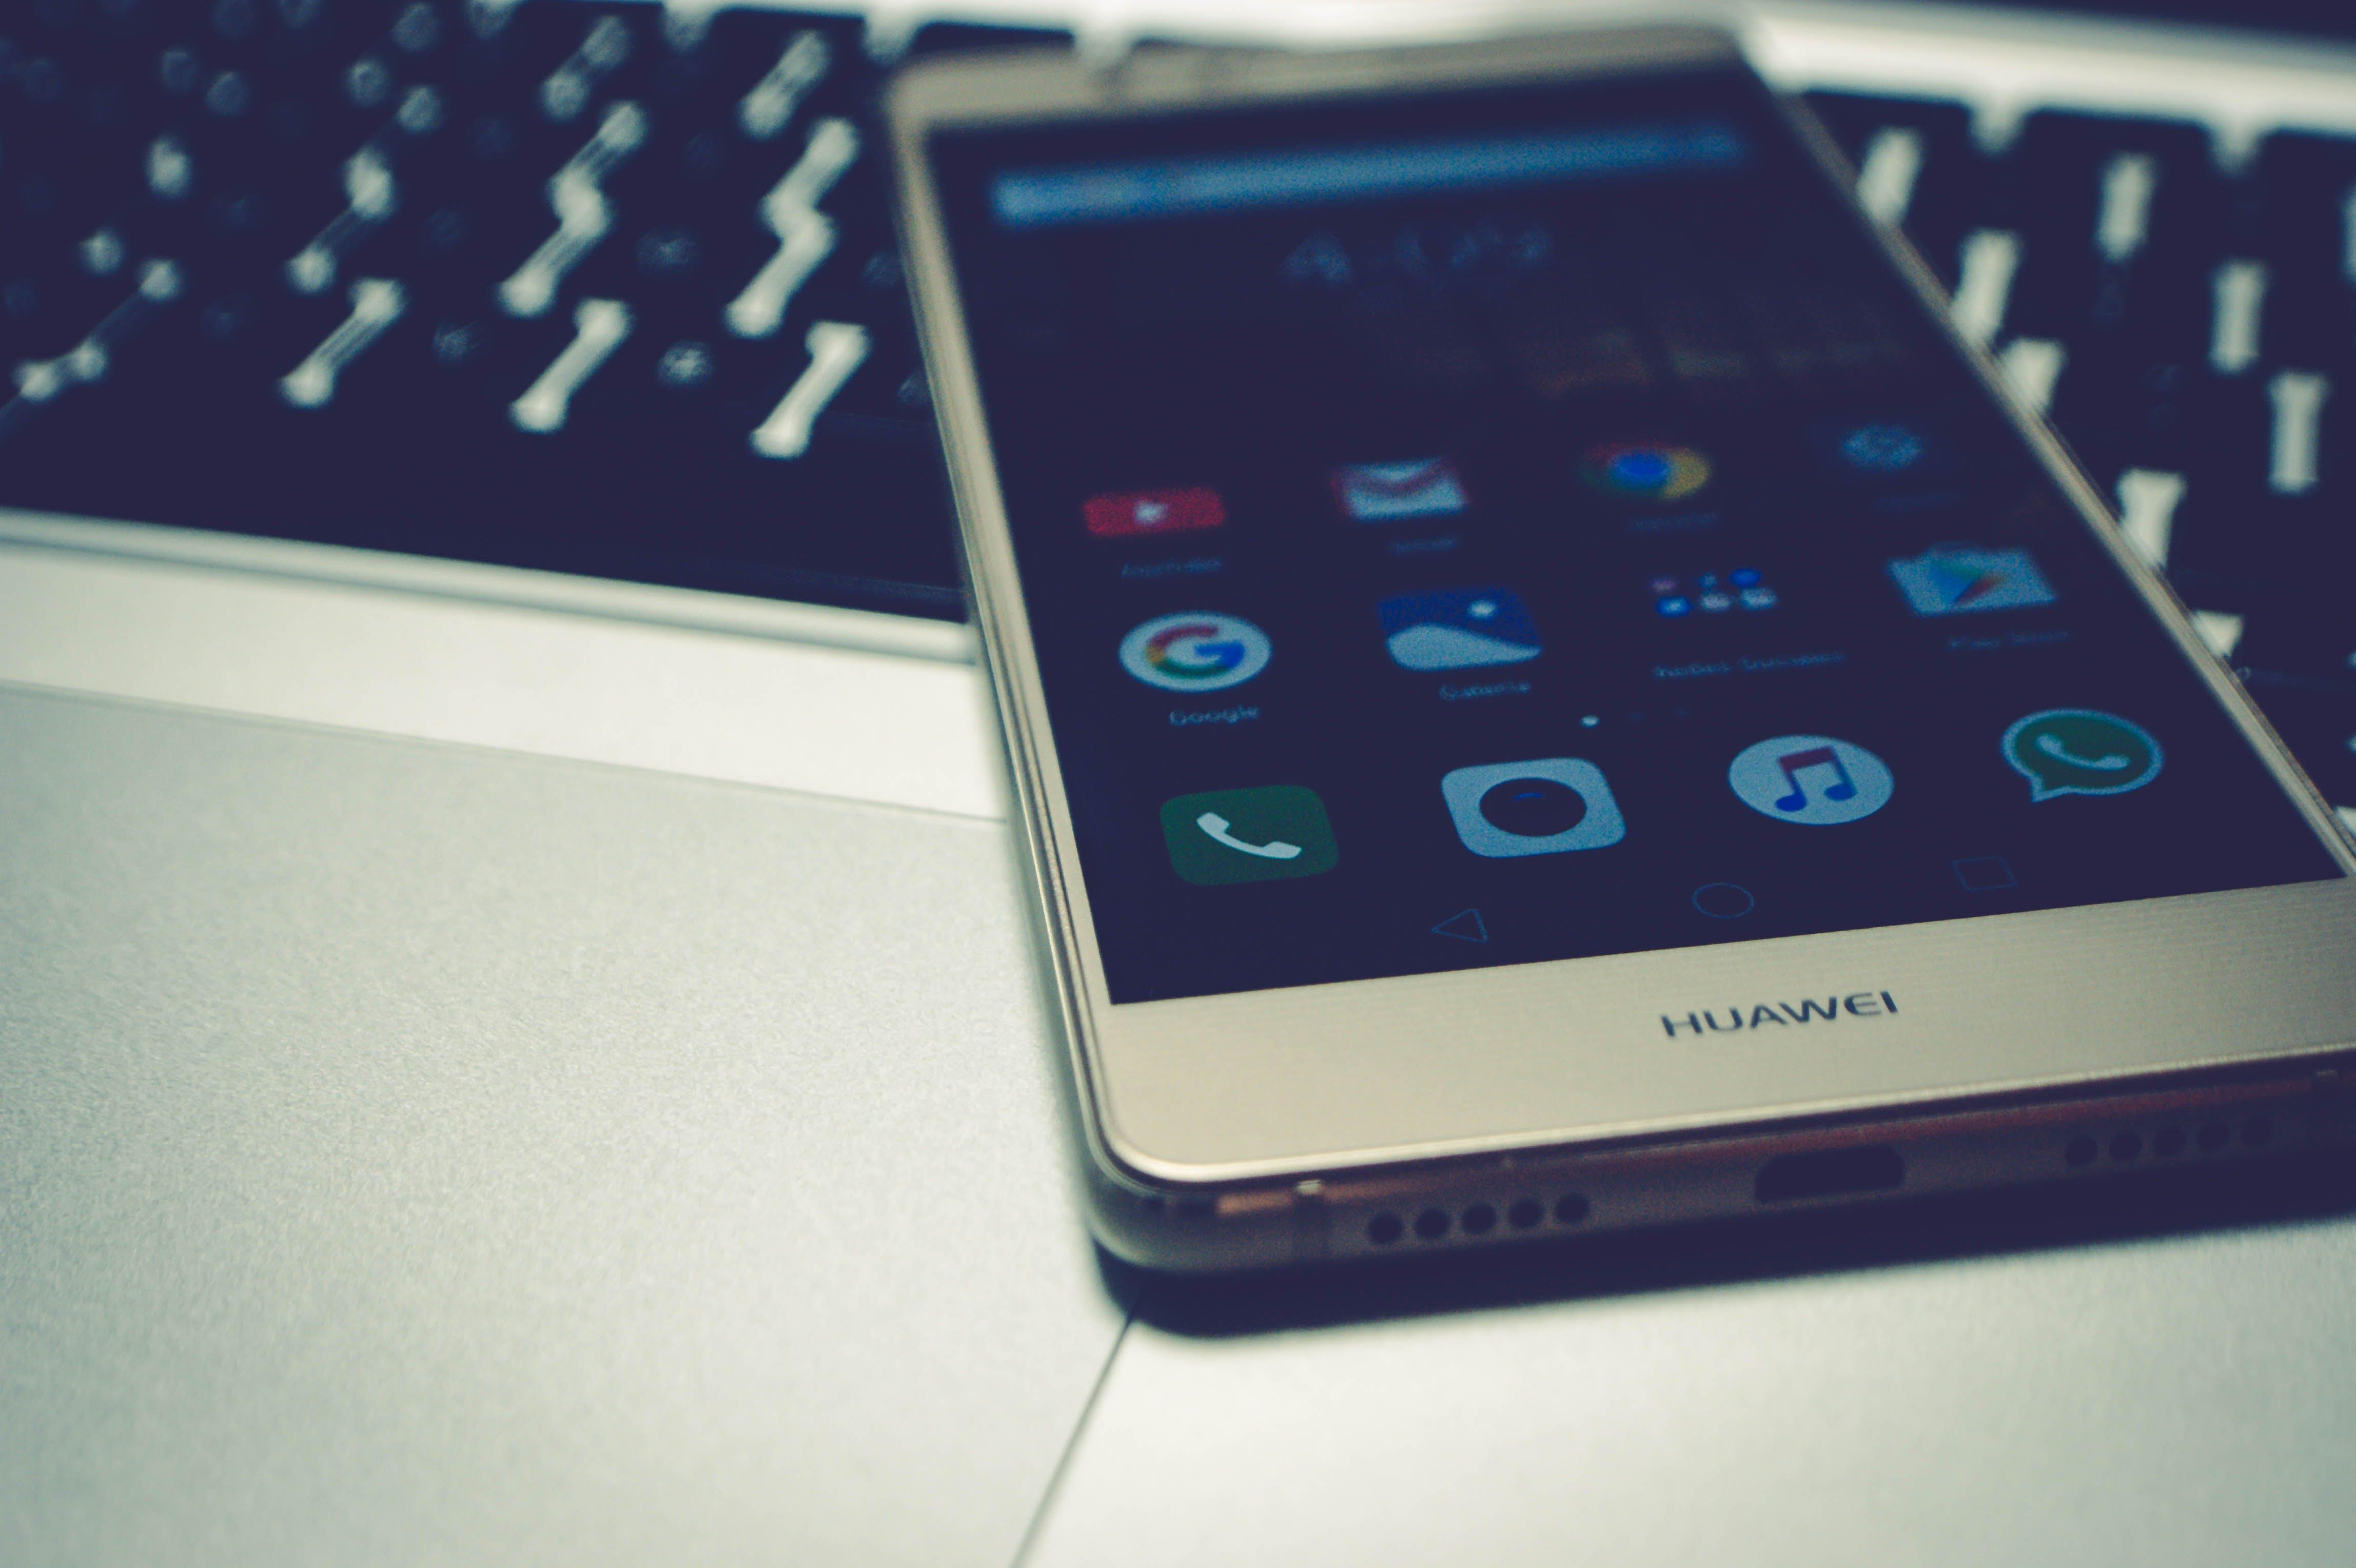 White Huawei Smartphone